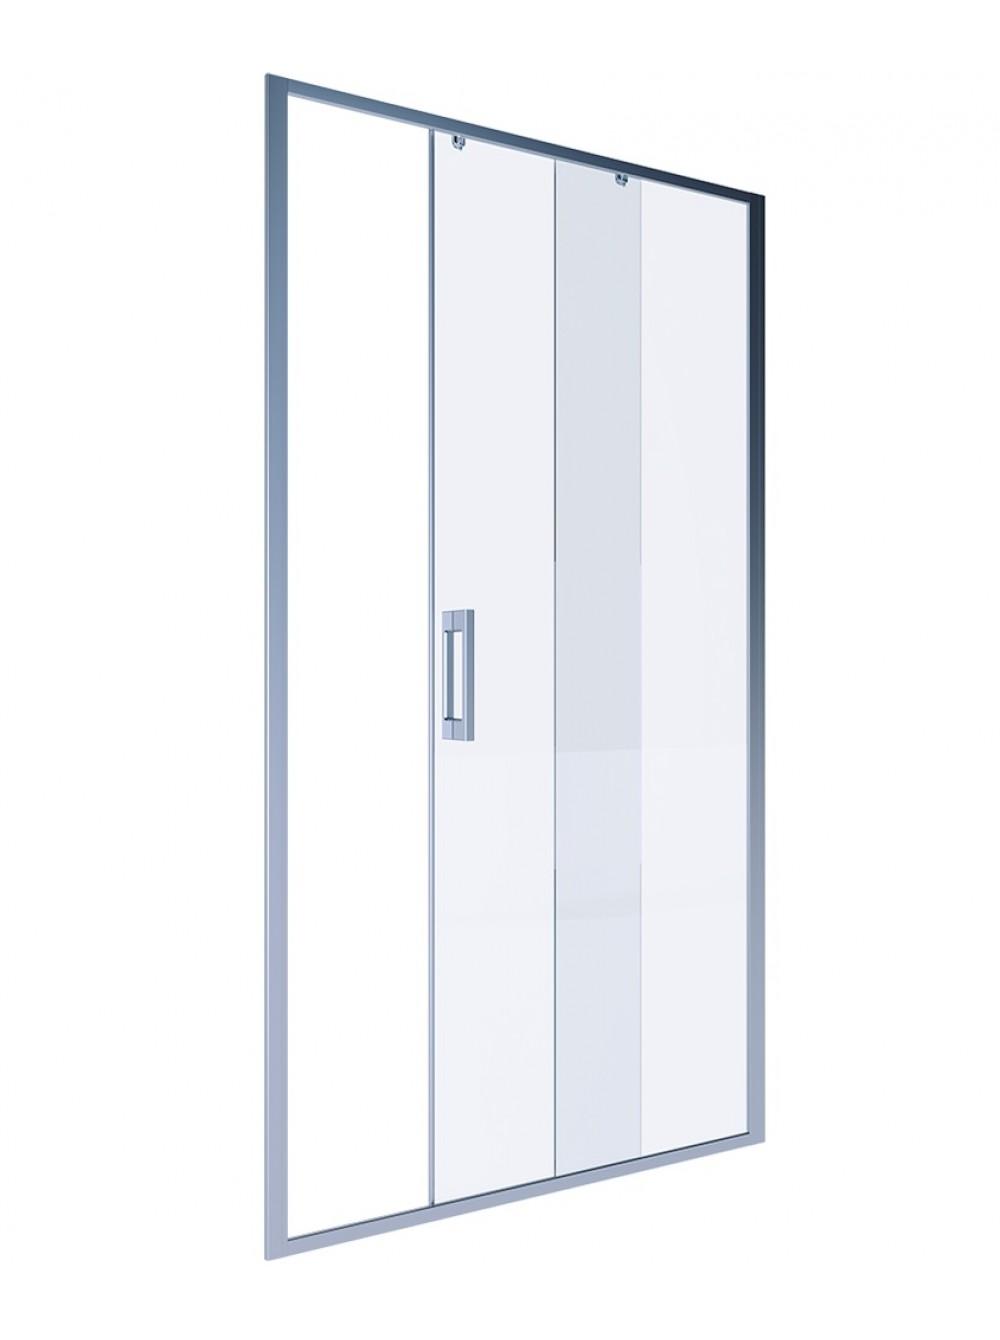 Душевая дверь AB61C110 110*200 Alex Baitler